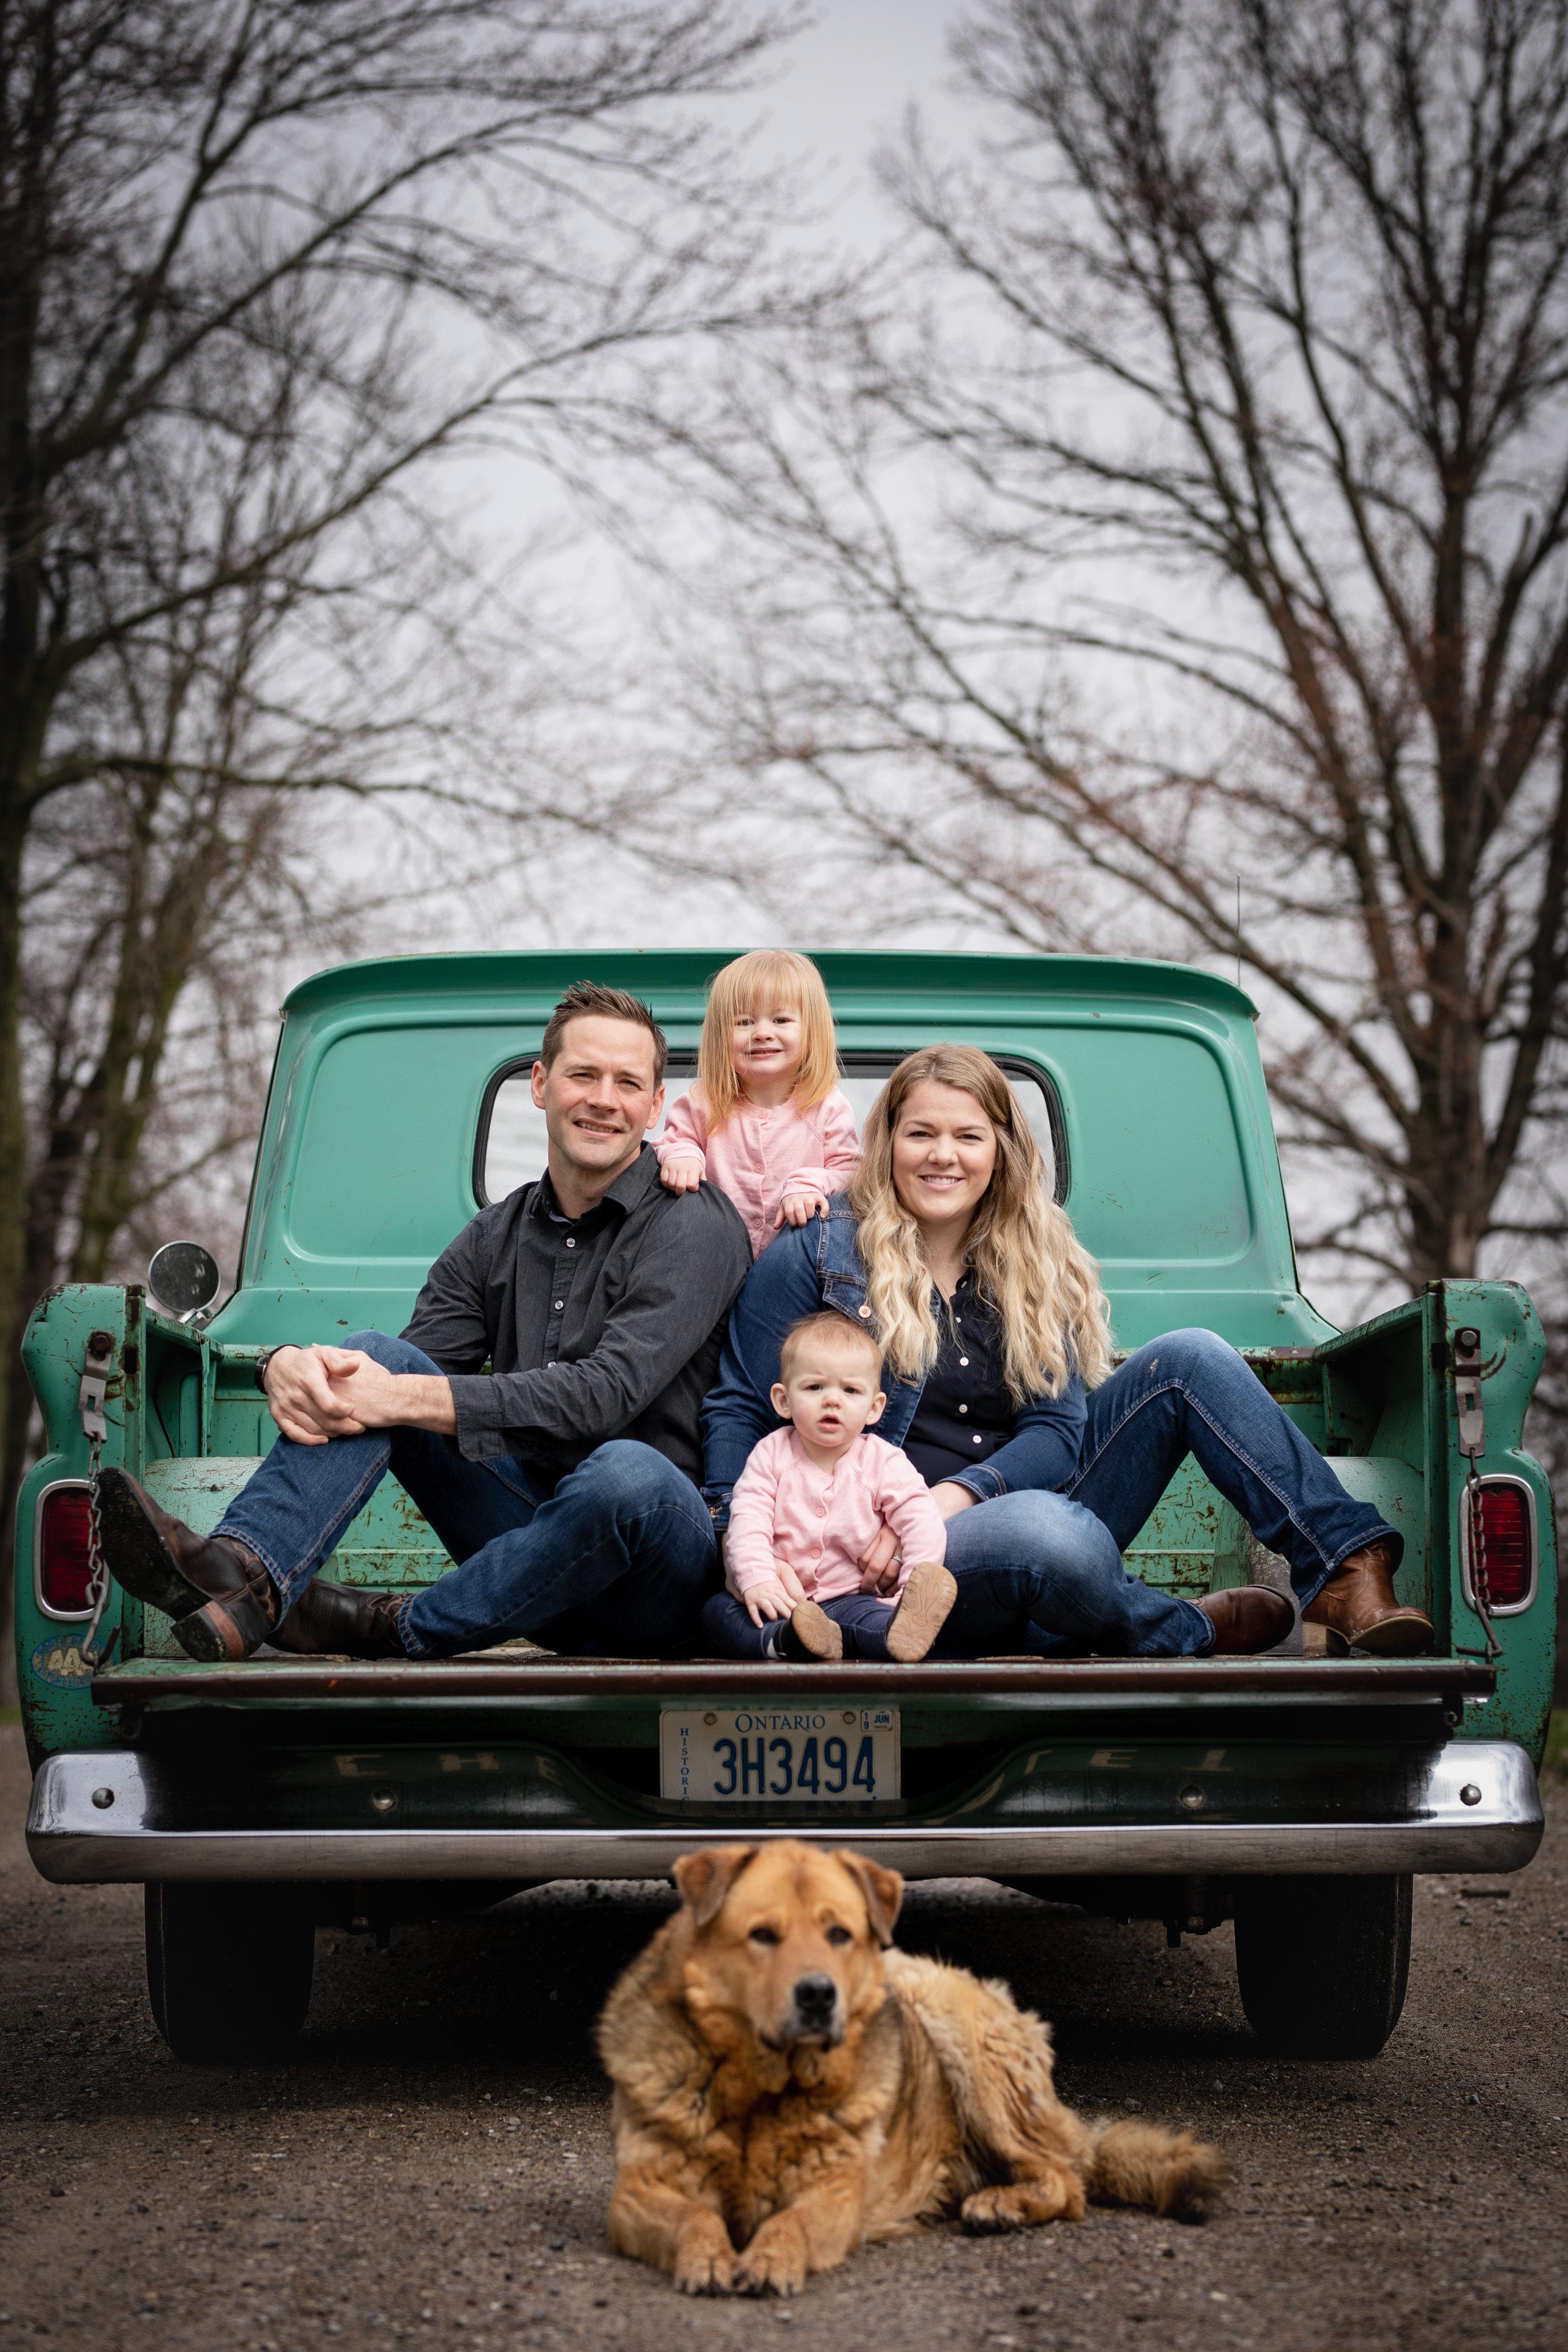 photographer-Family-Chevy-Truck-Blue-Dog-Jodie-Aldred-Photography-Middlesex-london-Dutton-glencoe-ontario-chatham-huron-lambton-elgin.jpg